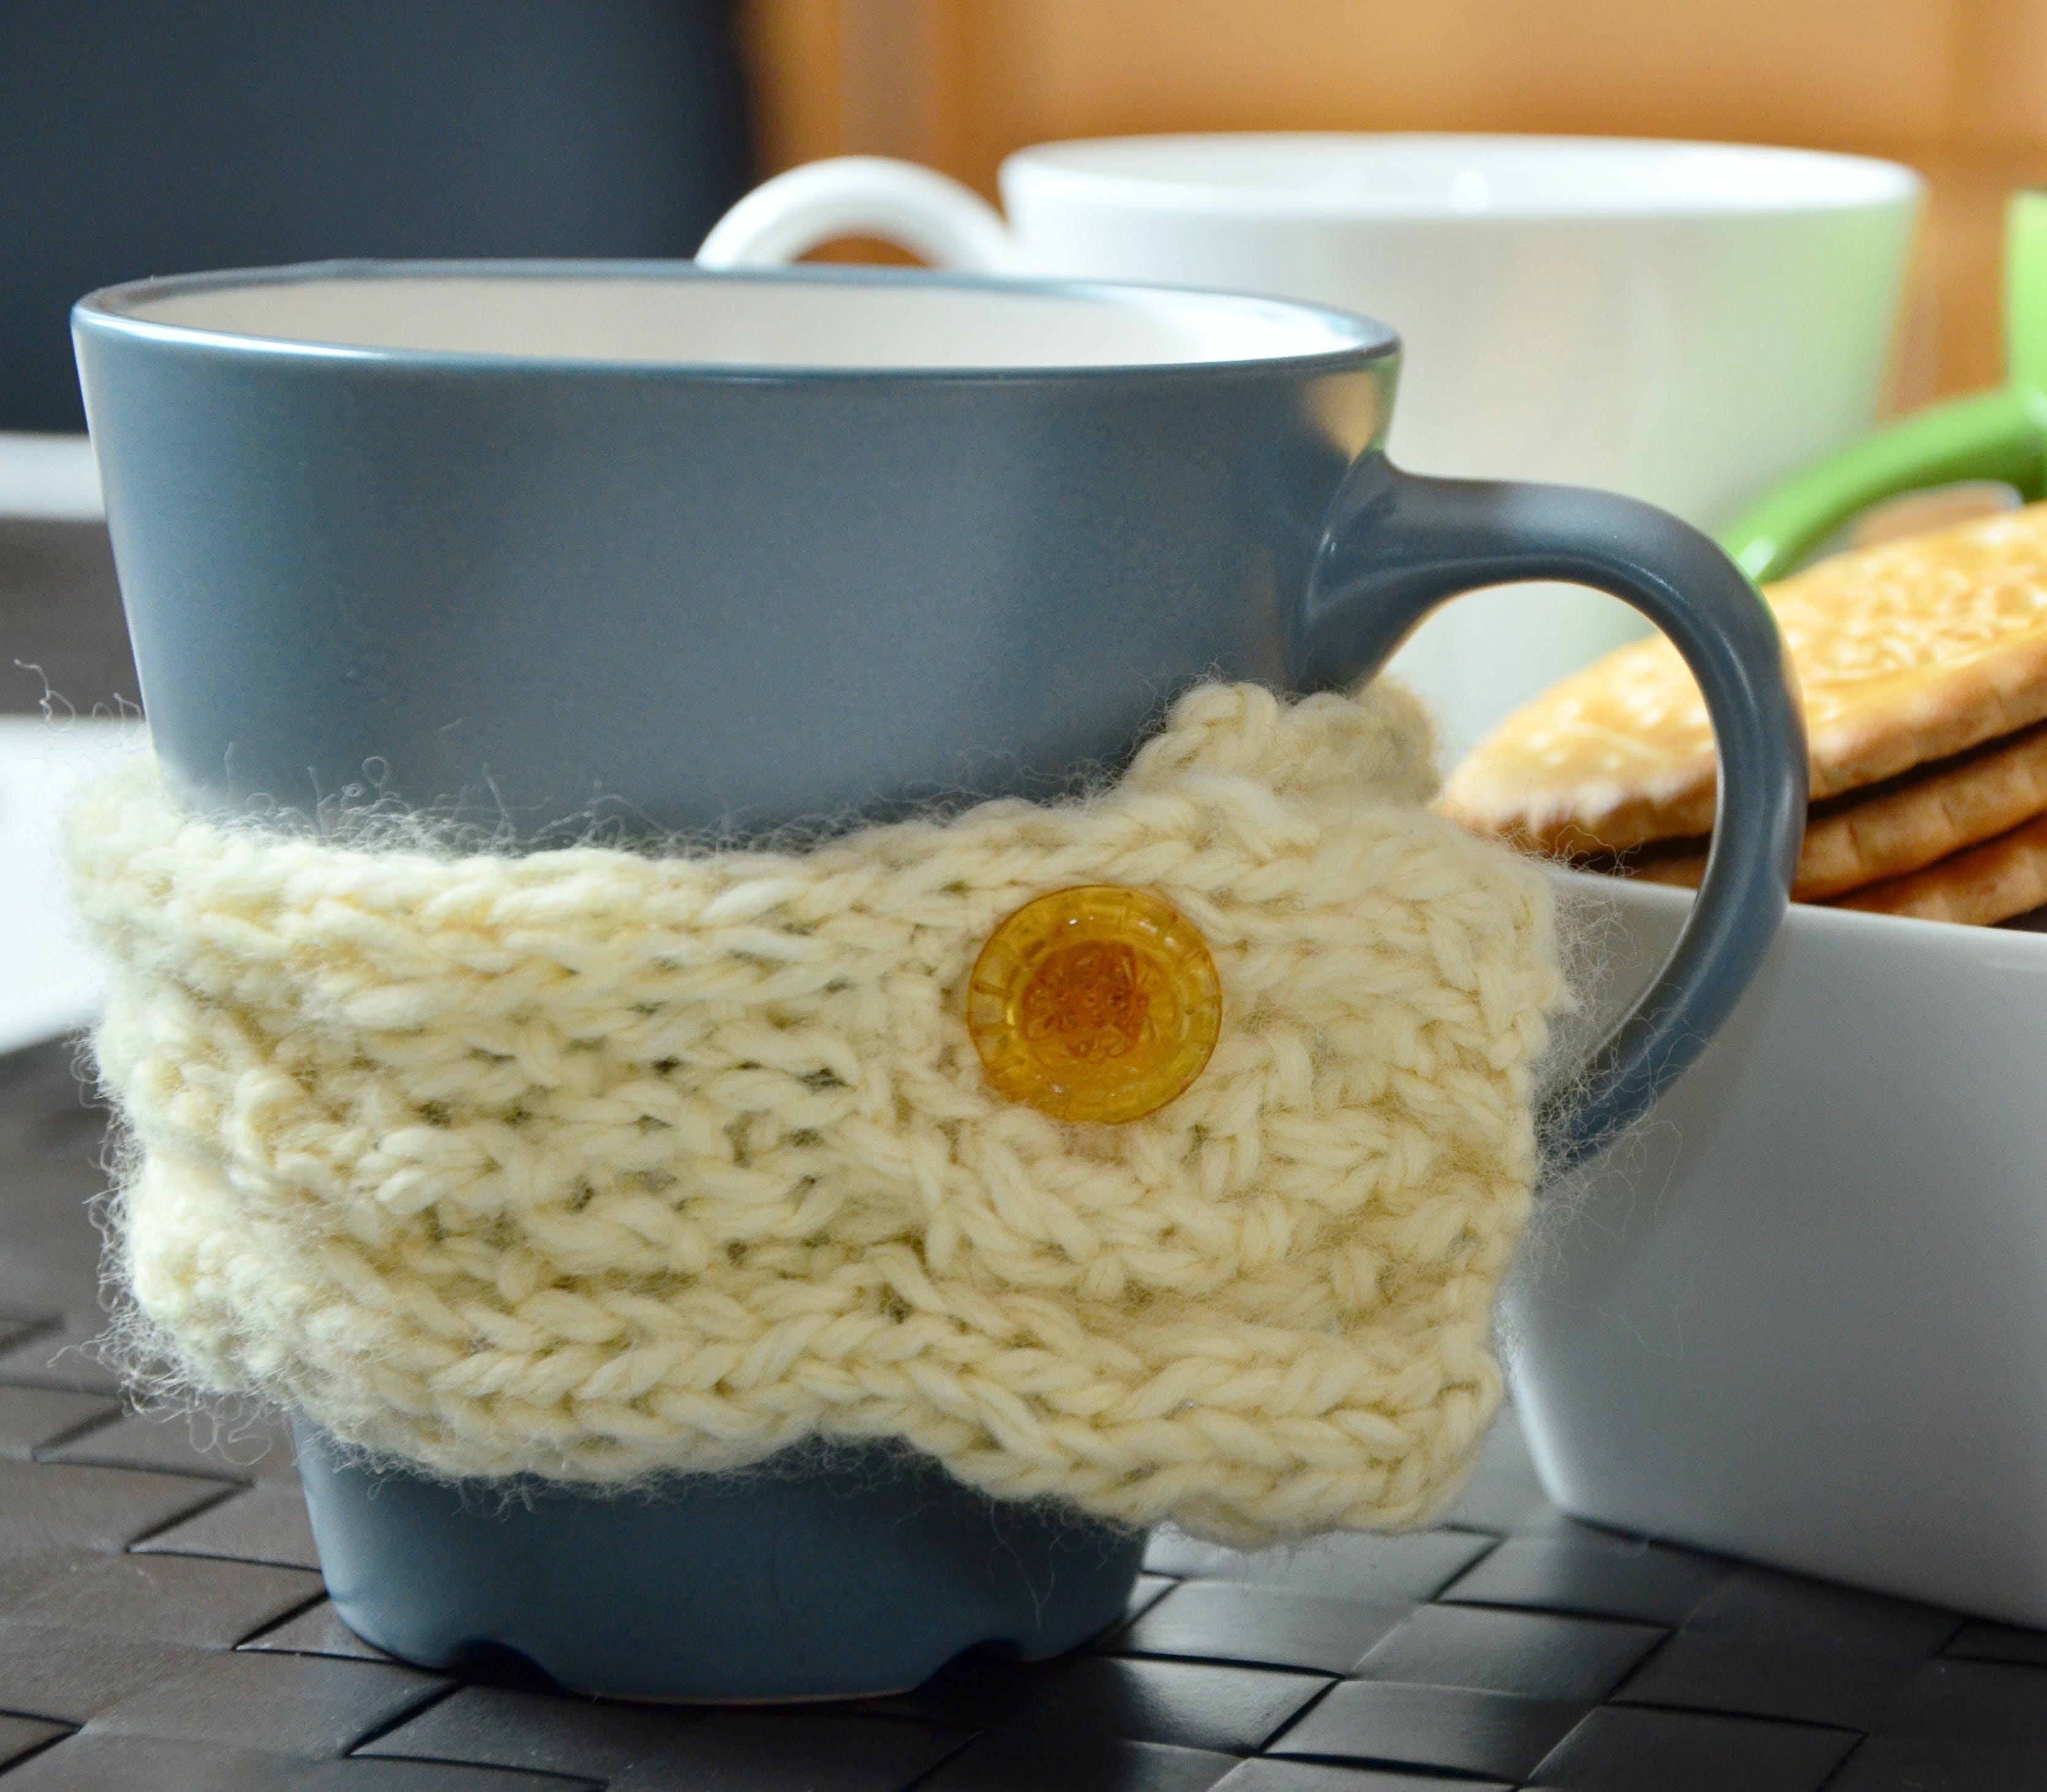 button, coffee break, coffee cup